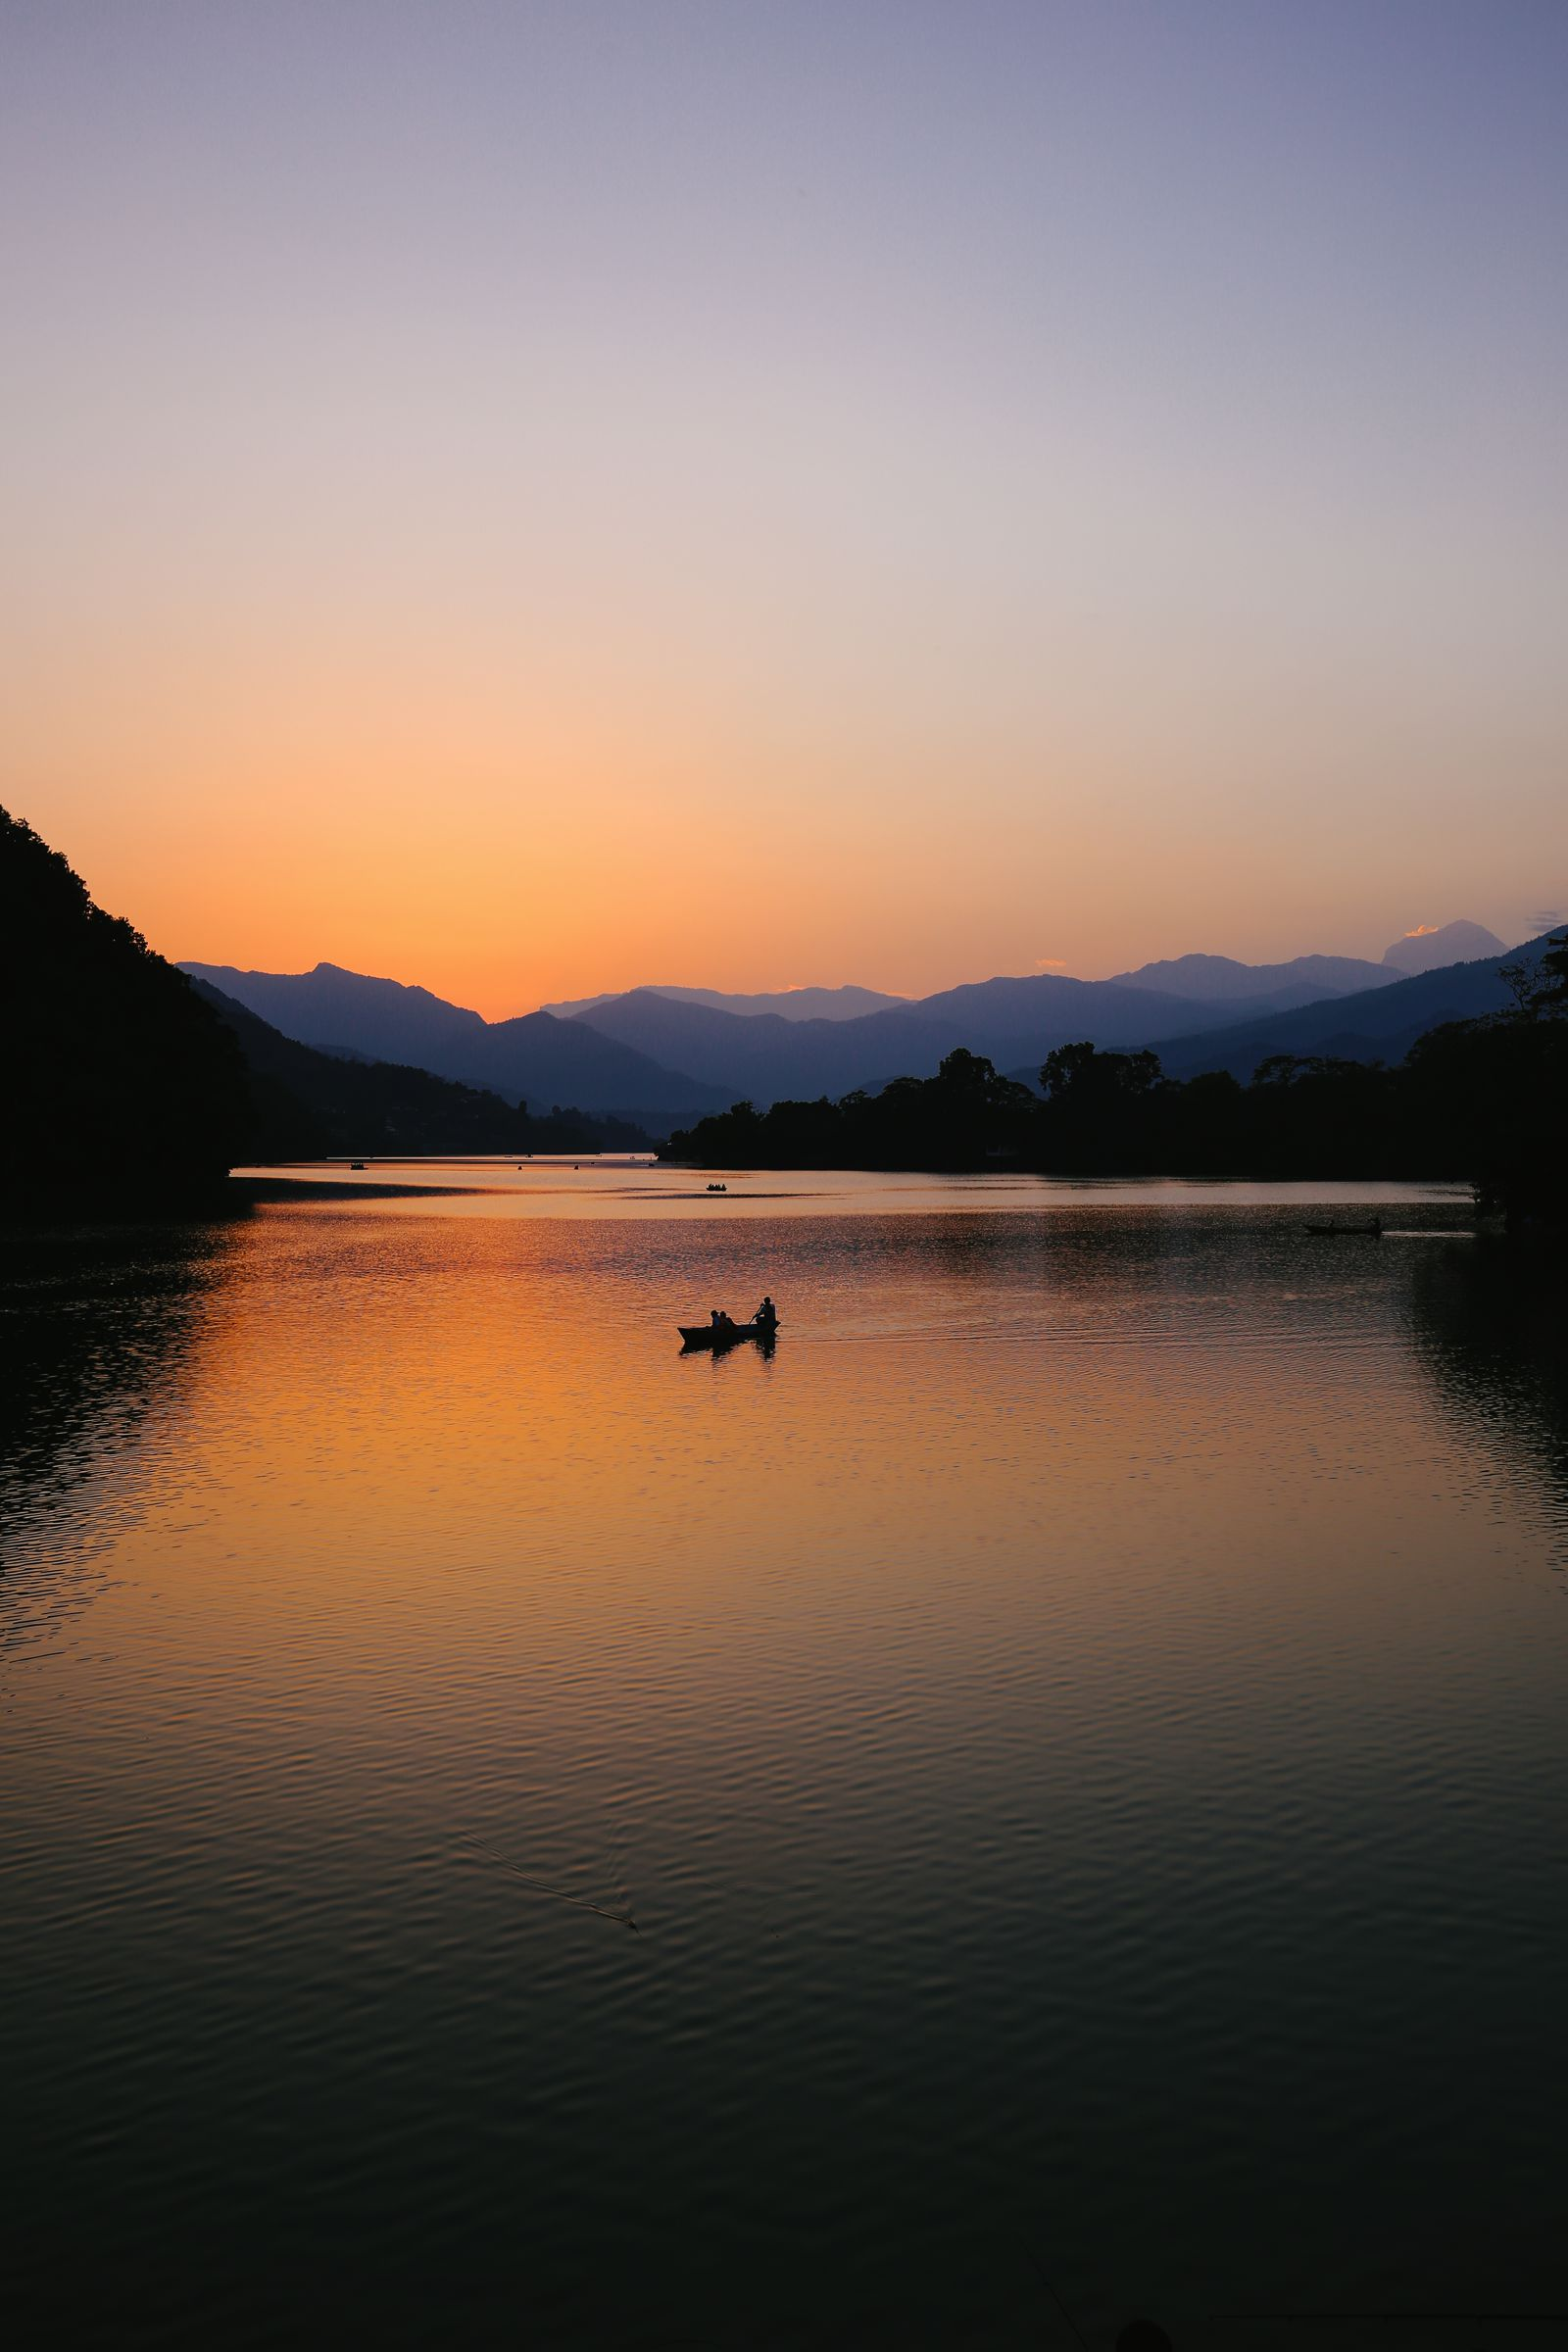 Photos And Postcards From Nepal... Chitwan, Kathmandu, Bhaktapur, Panauti, Pokhara, Tansen, Palpa, Lumbini (32)